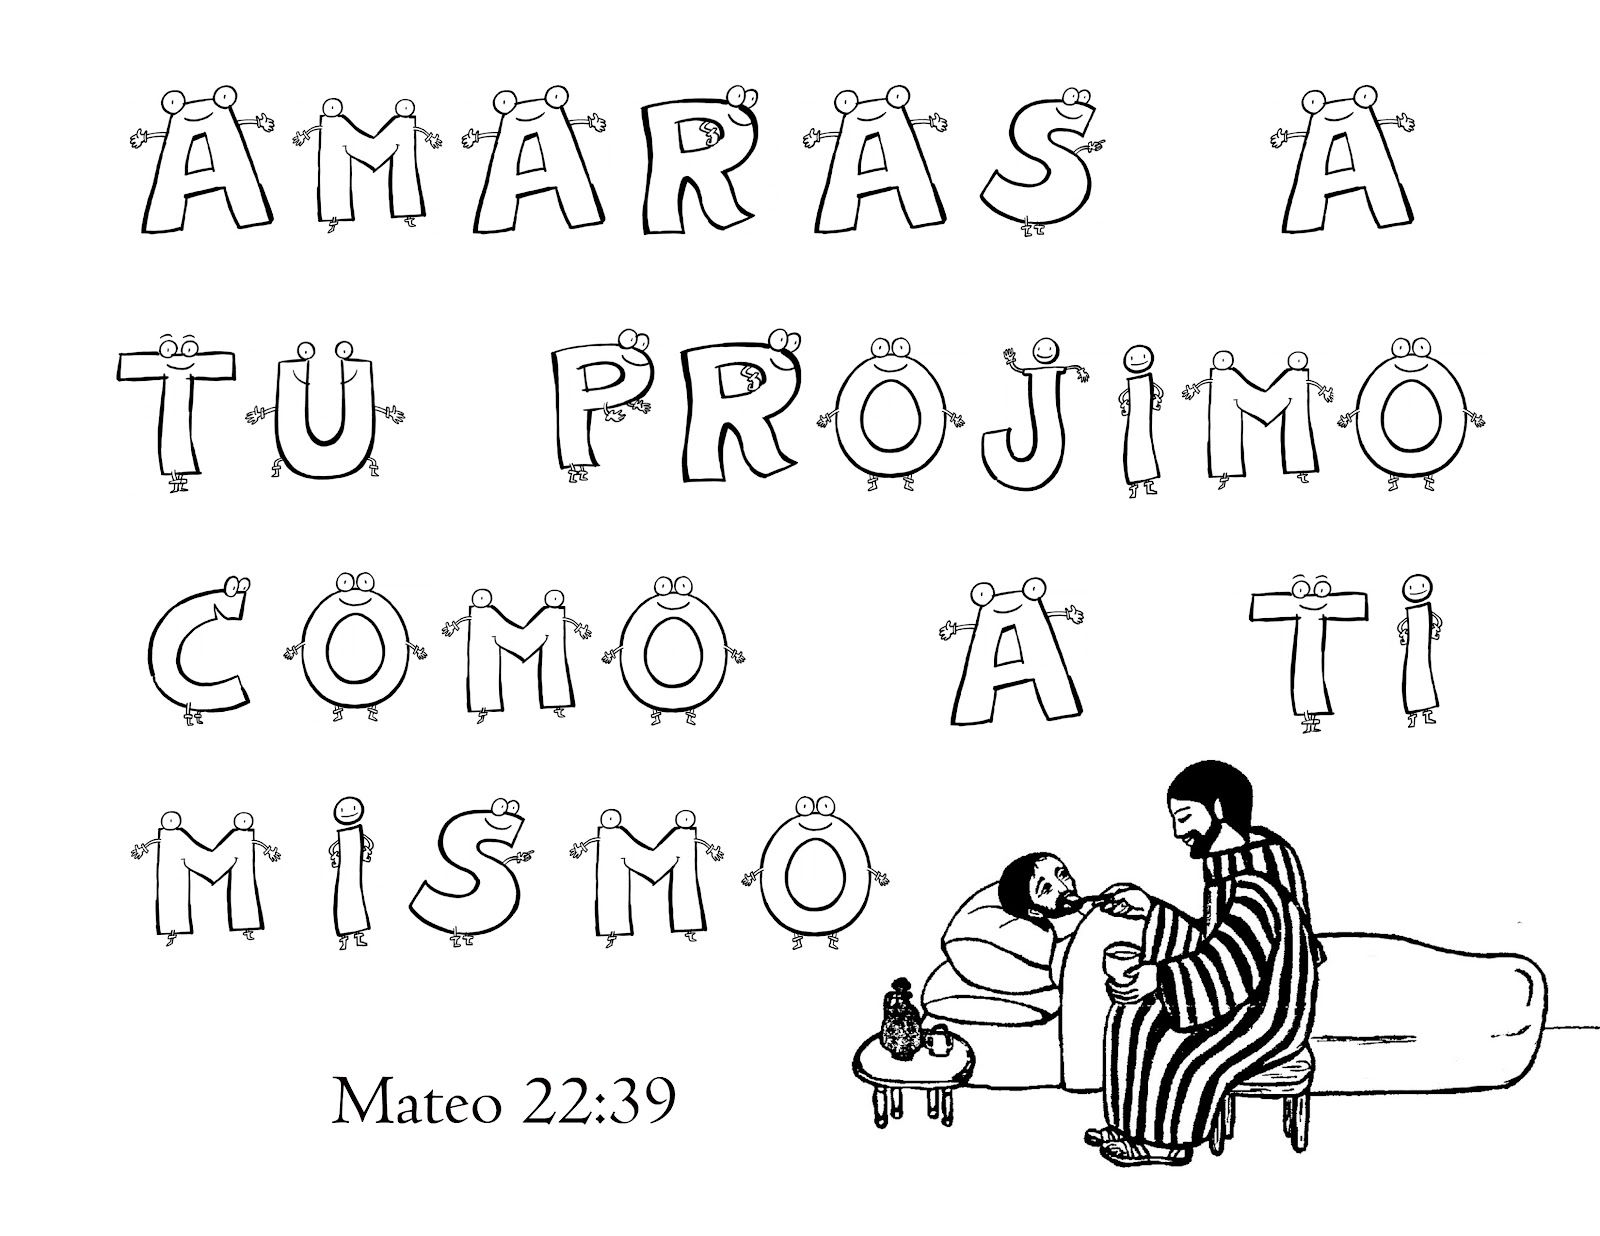 DIBUJOS PARA COLOREAR: TEXTOS BIBLICOS PARA COLOREAR CON DIBUJO ...